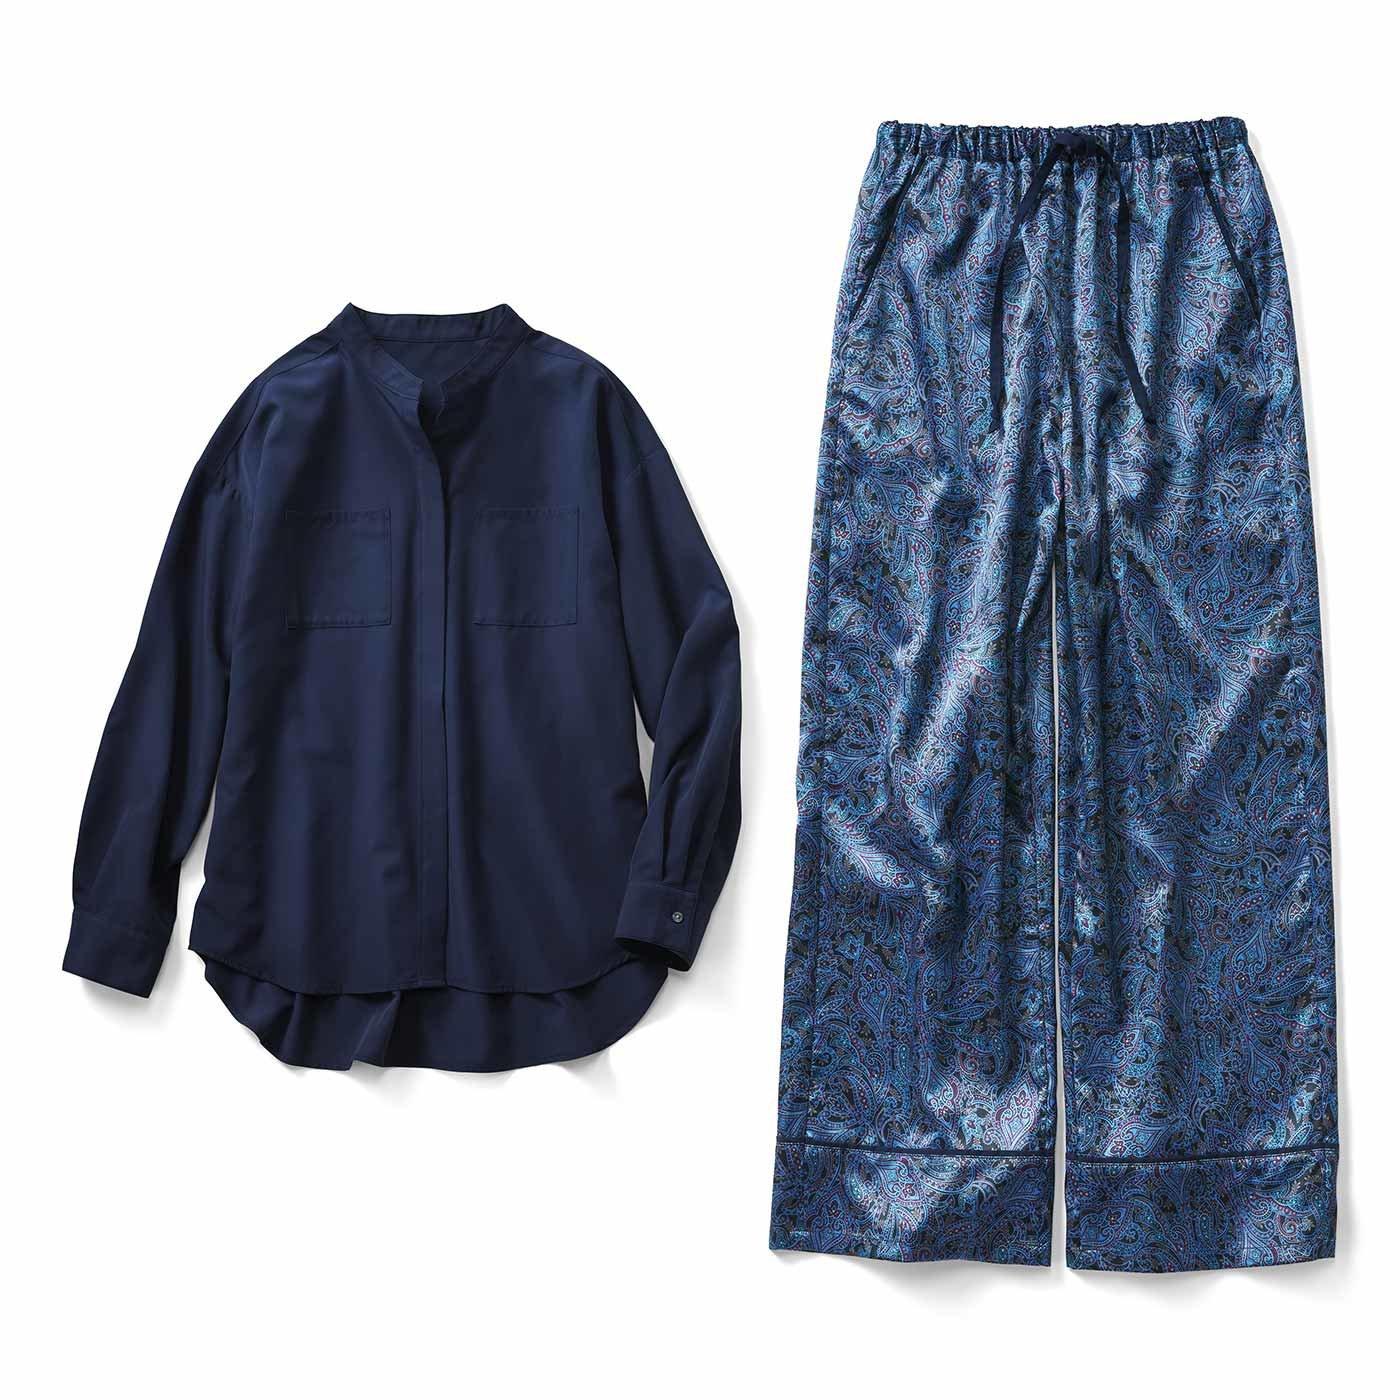 IEDIT[イディット]  小森美穂子さんコラボ とろみブラウスとこだわりシック柄パンツのコーディネイトセット〈ネイビー〉